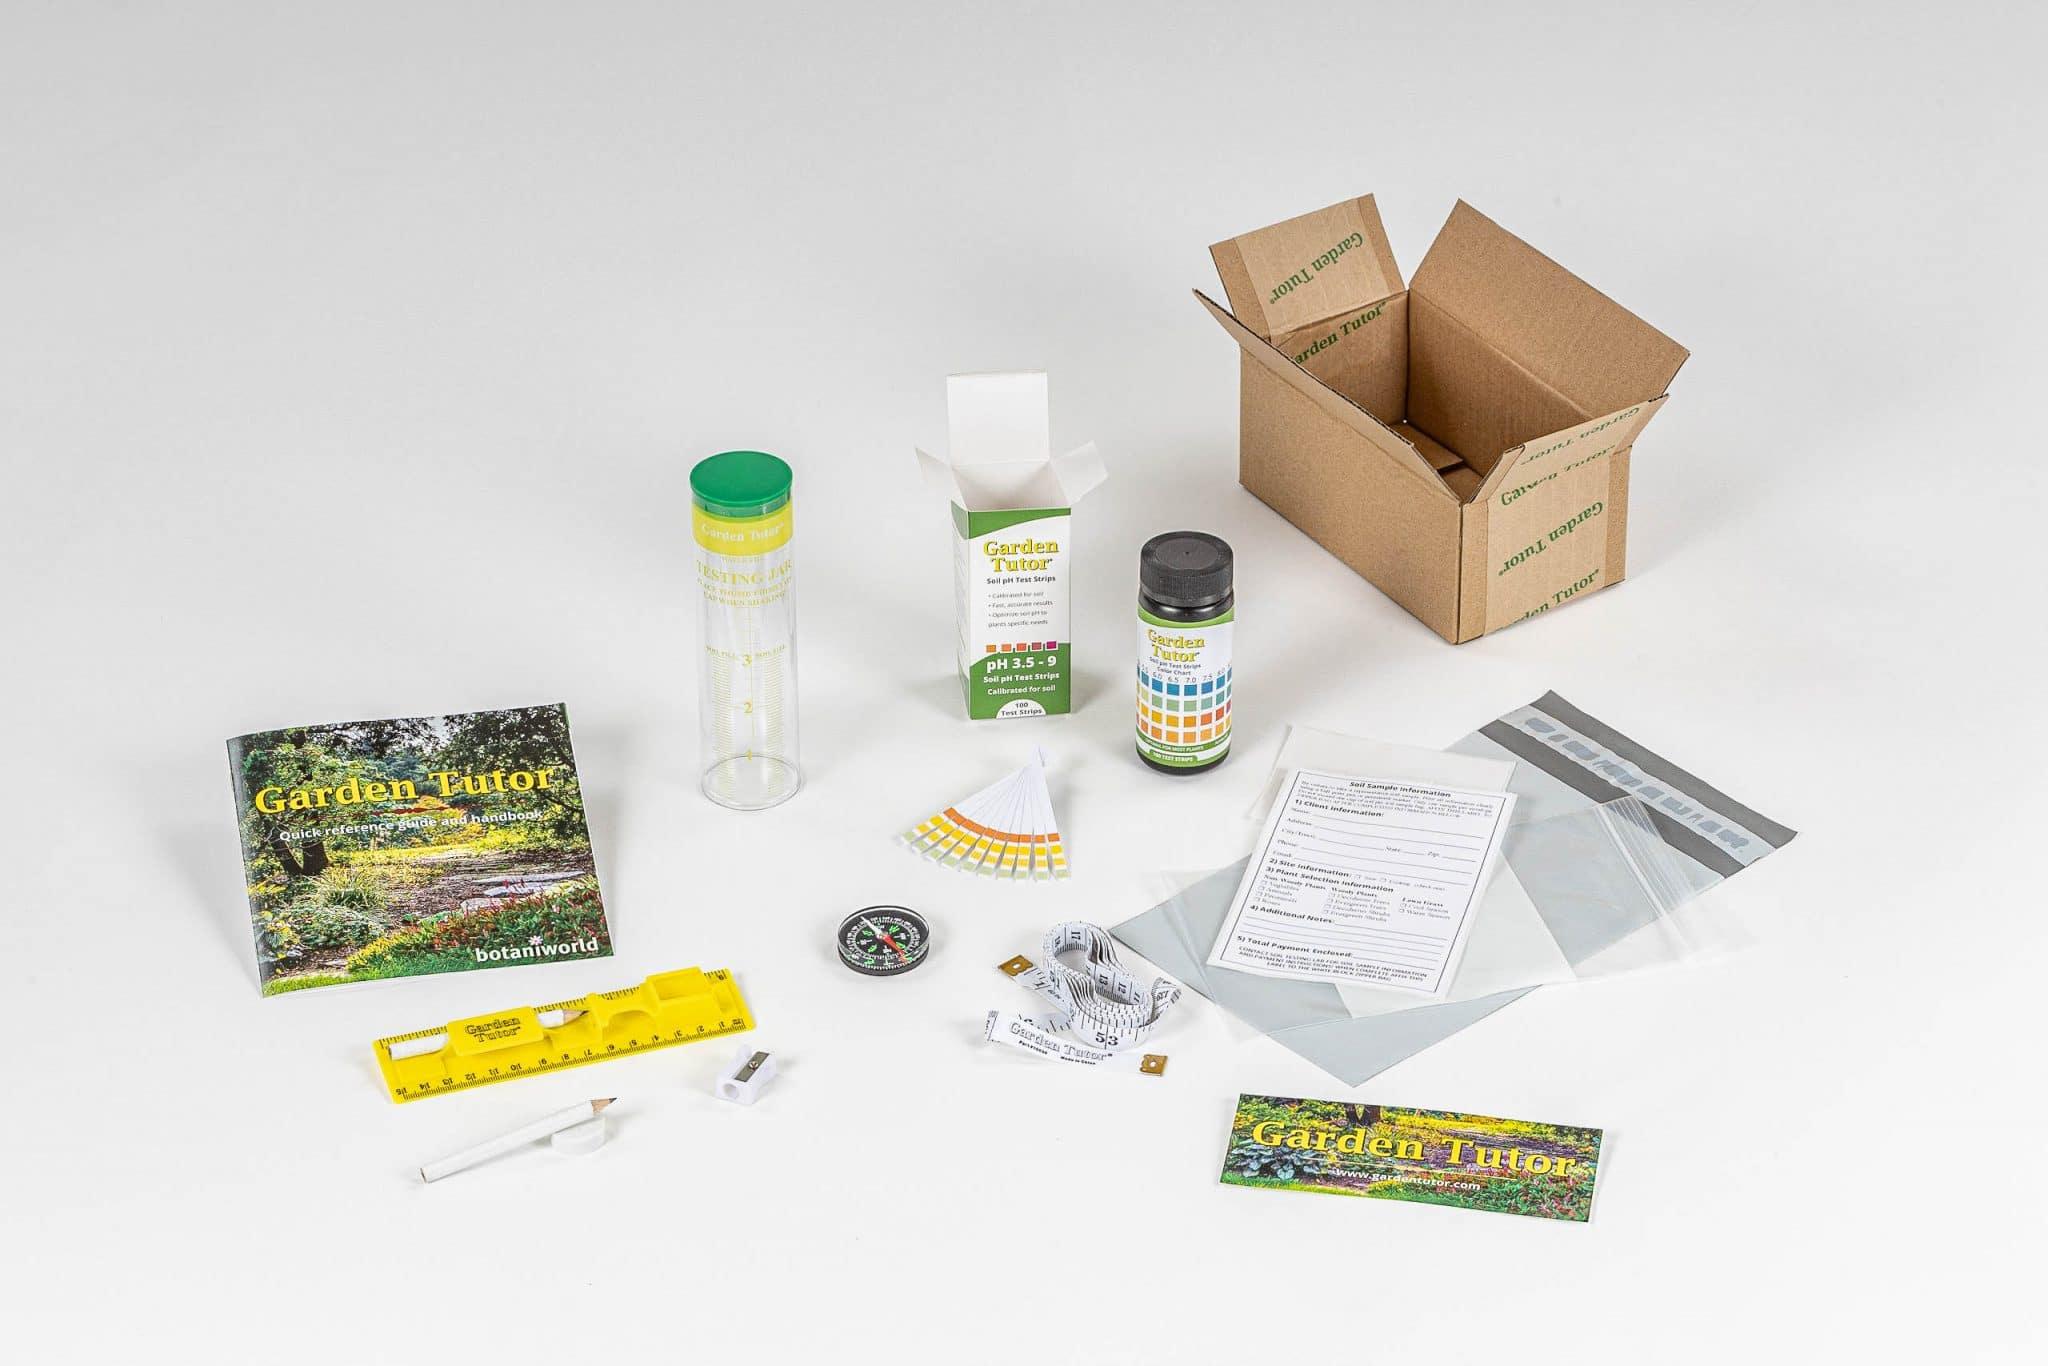 Master Garden Tutor Course Kit